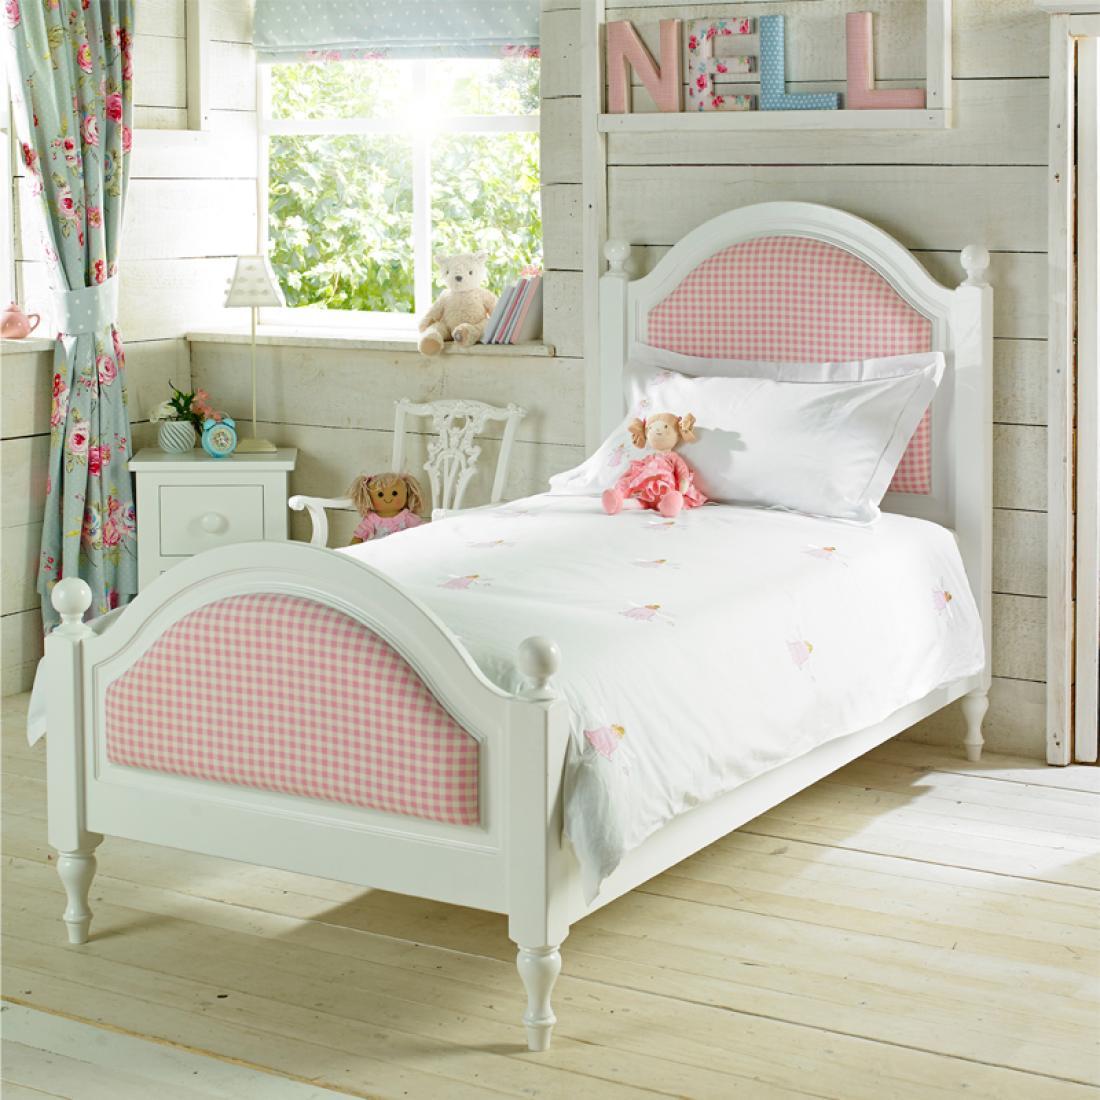 Bedroom Furniture Upholstered Headboard